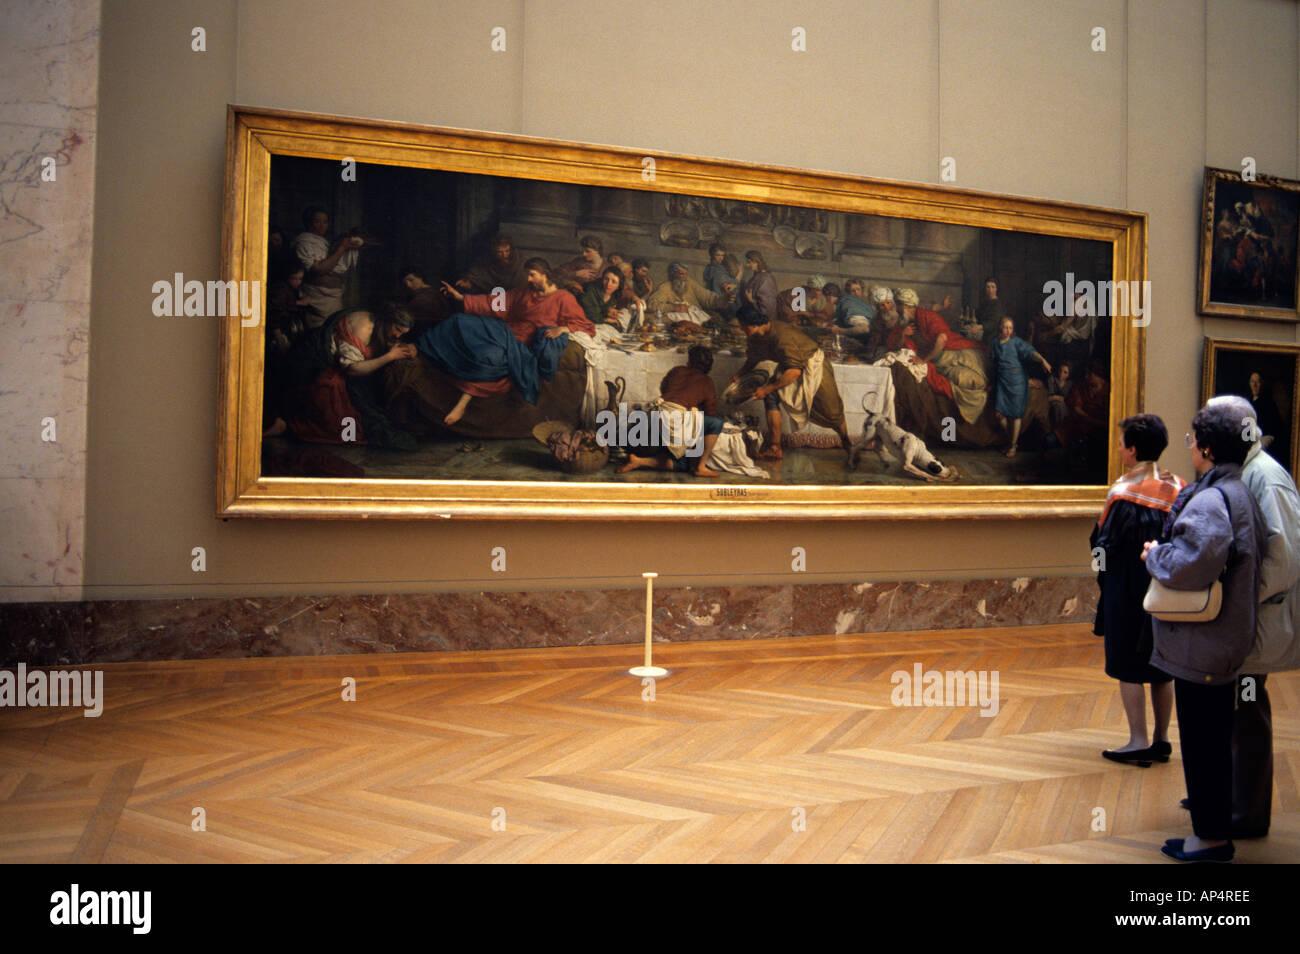 Famous Artwork Inside The Louvre